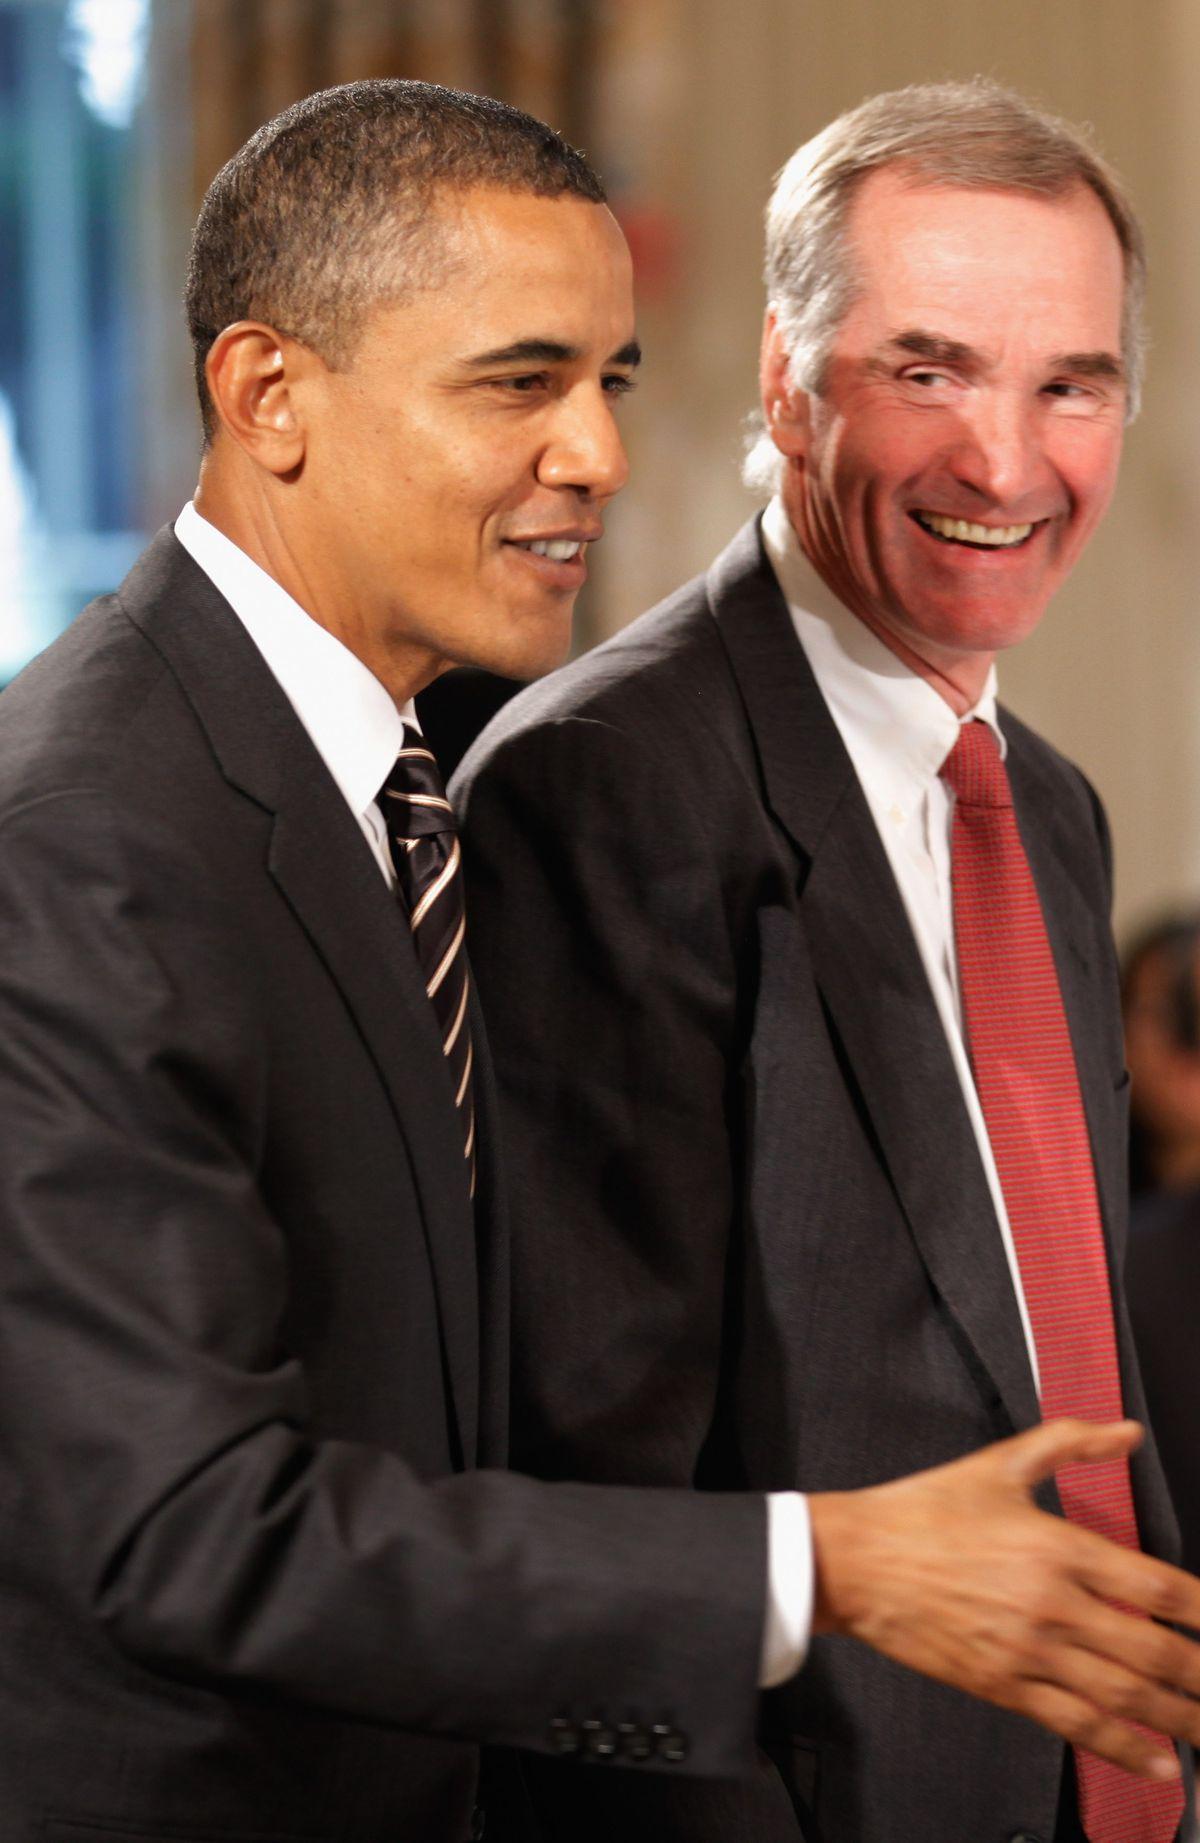 Barack Obama on left, David Swensen on right